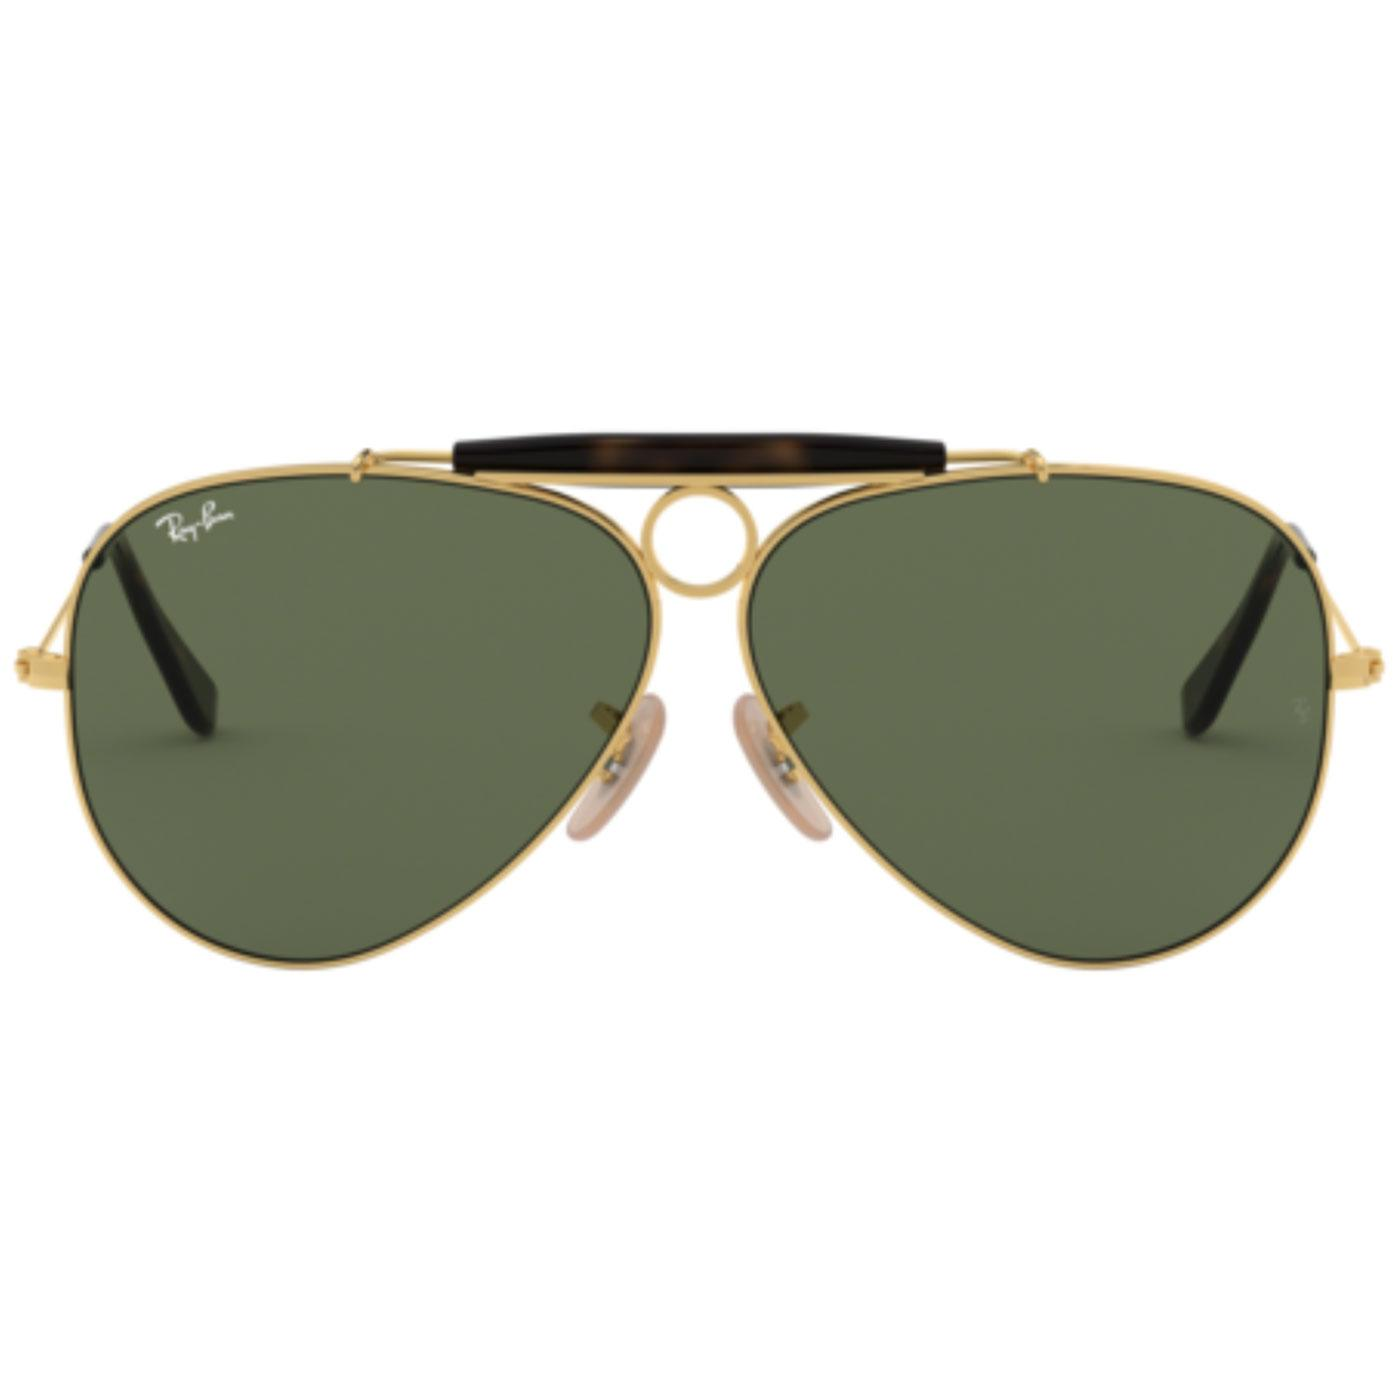 Shooter RAY-BAN Retro 60s Mod Aviator Sunglasses